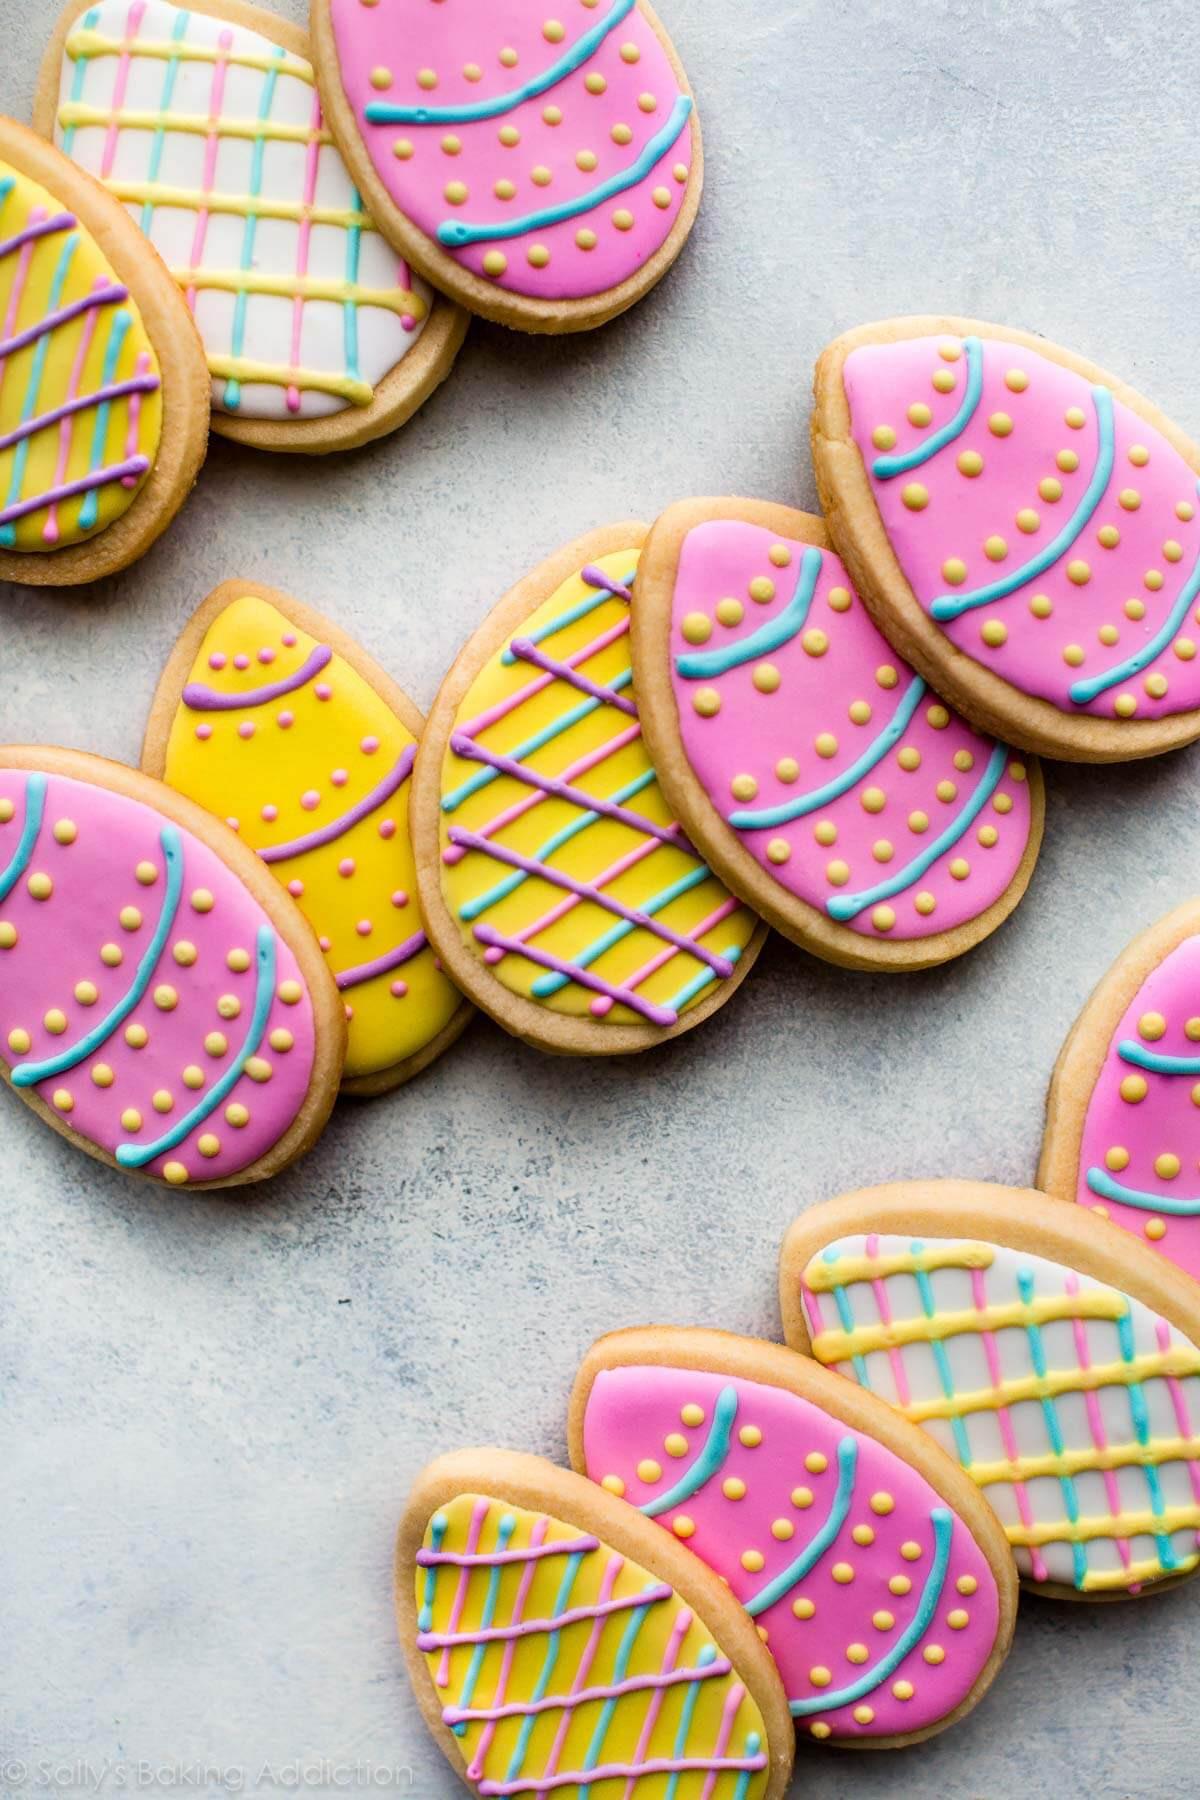 Easter Sugar Cookies  Easter Egg Sugar Cookies Sallys Baking Addiction